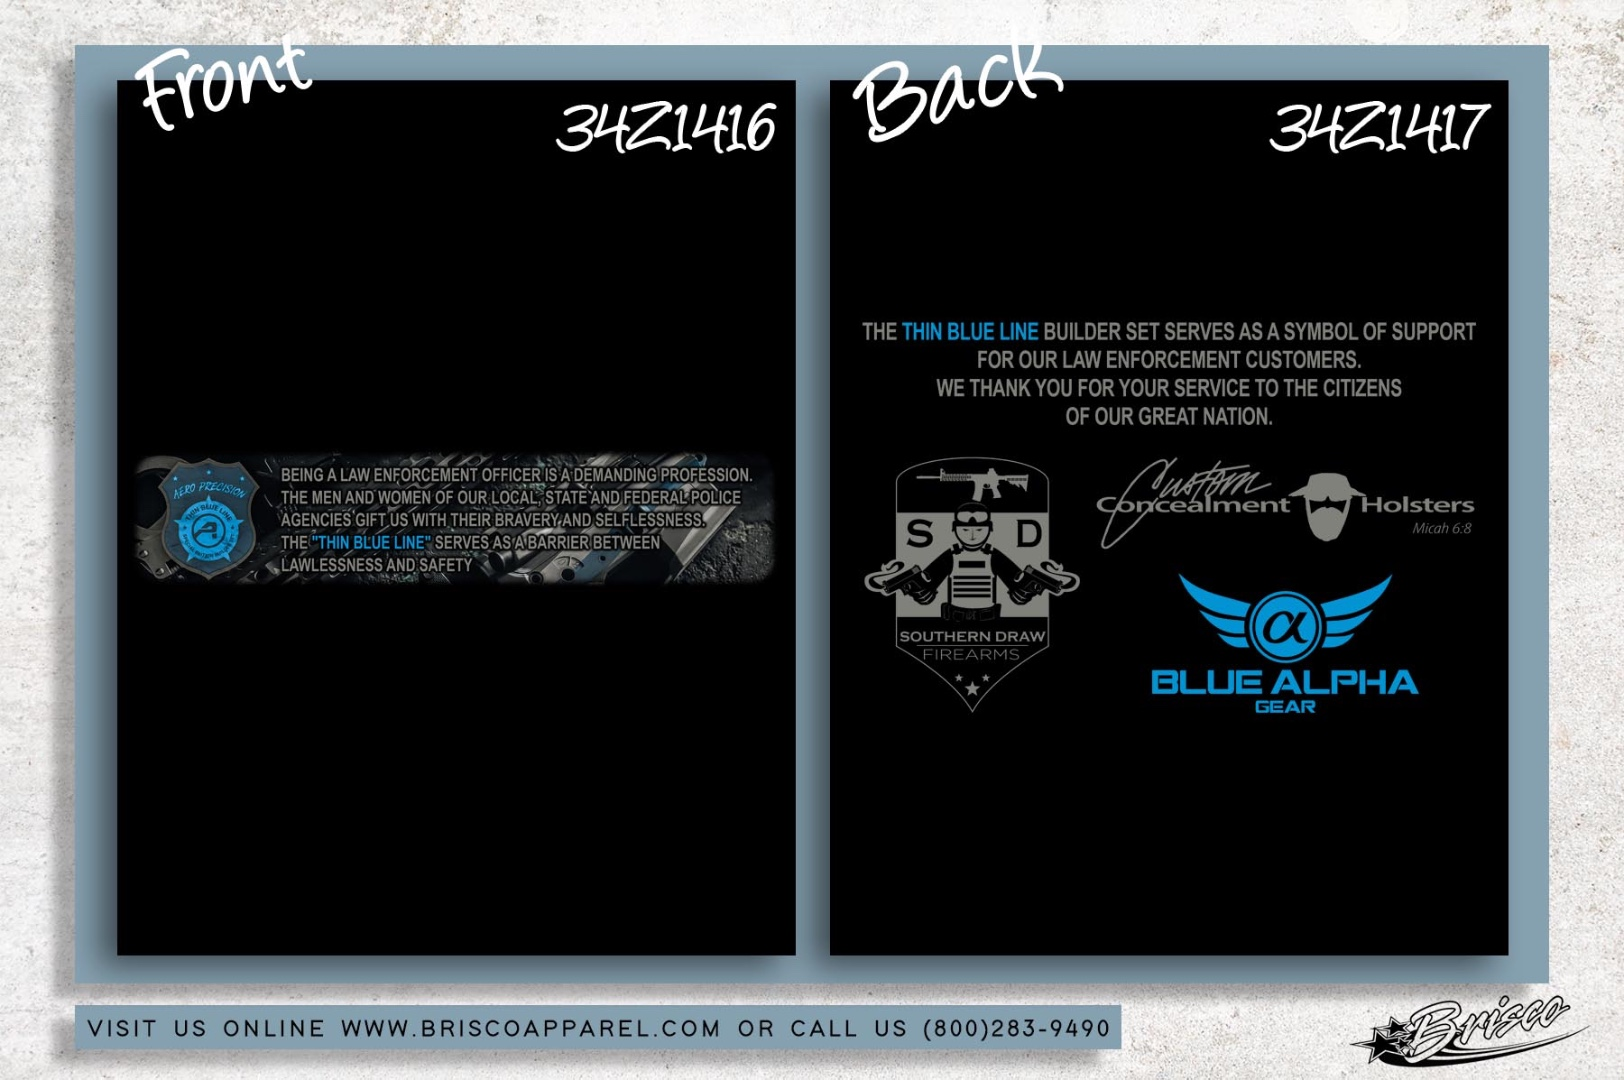 34Z1416 34Z1417 - Thin Blue Line - Design - Black.jpg